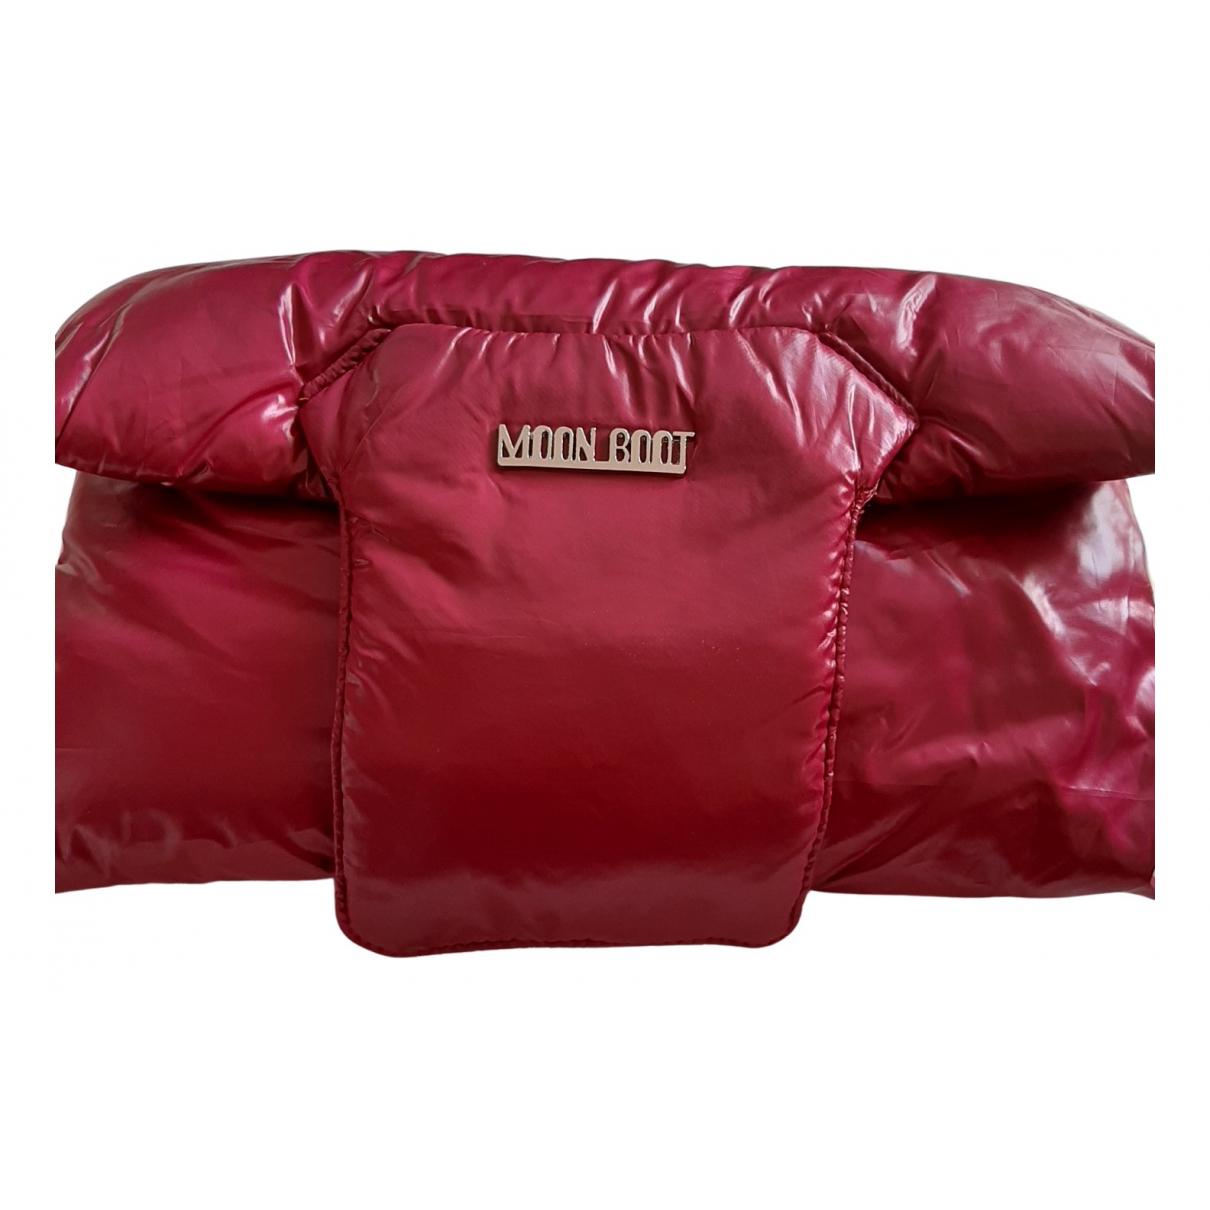 Moon Boot N Cloth Clutch bag for Women N